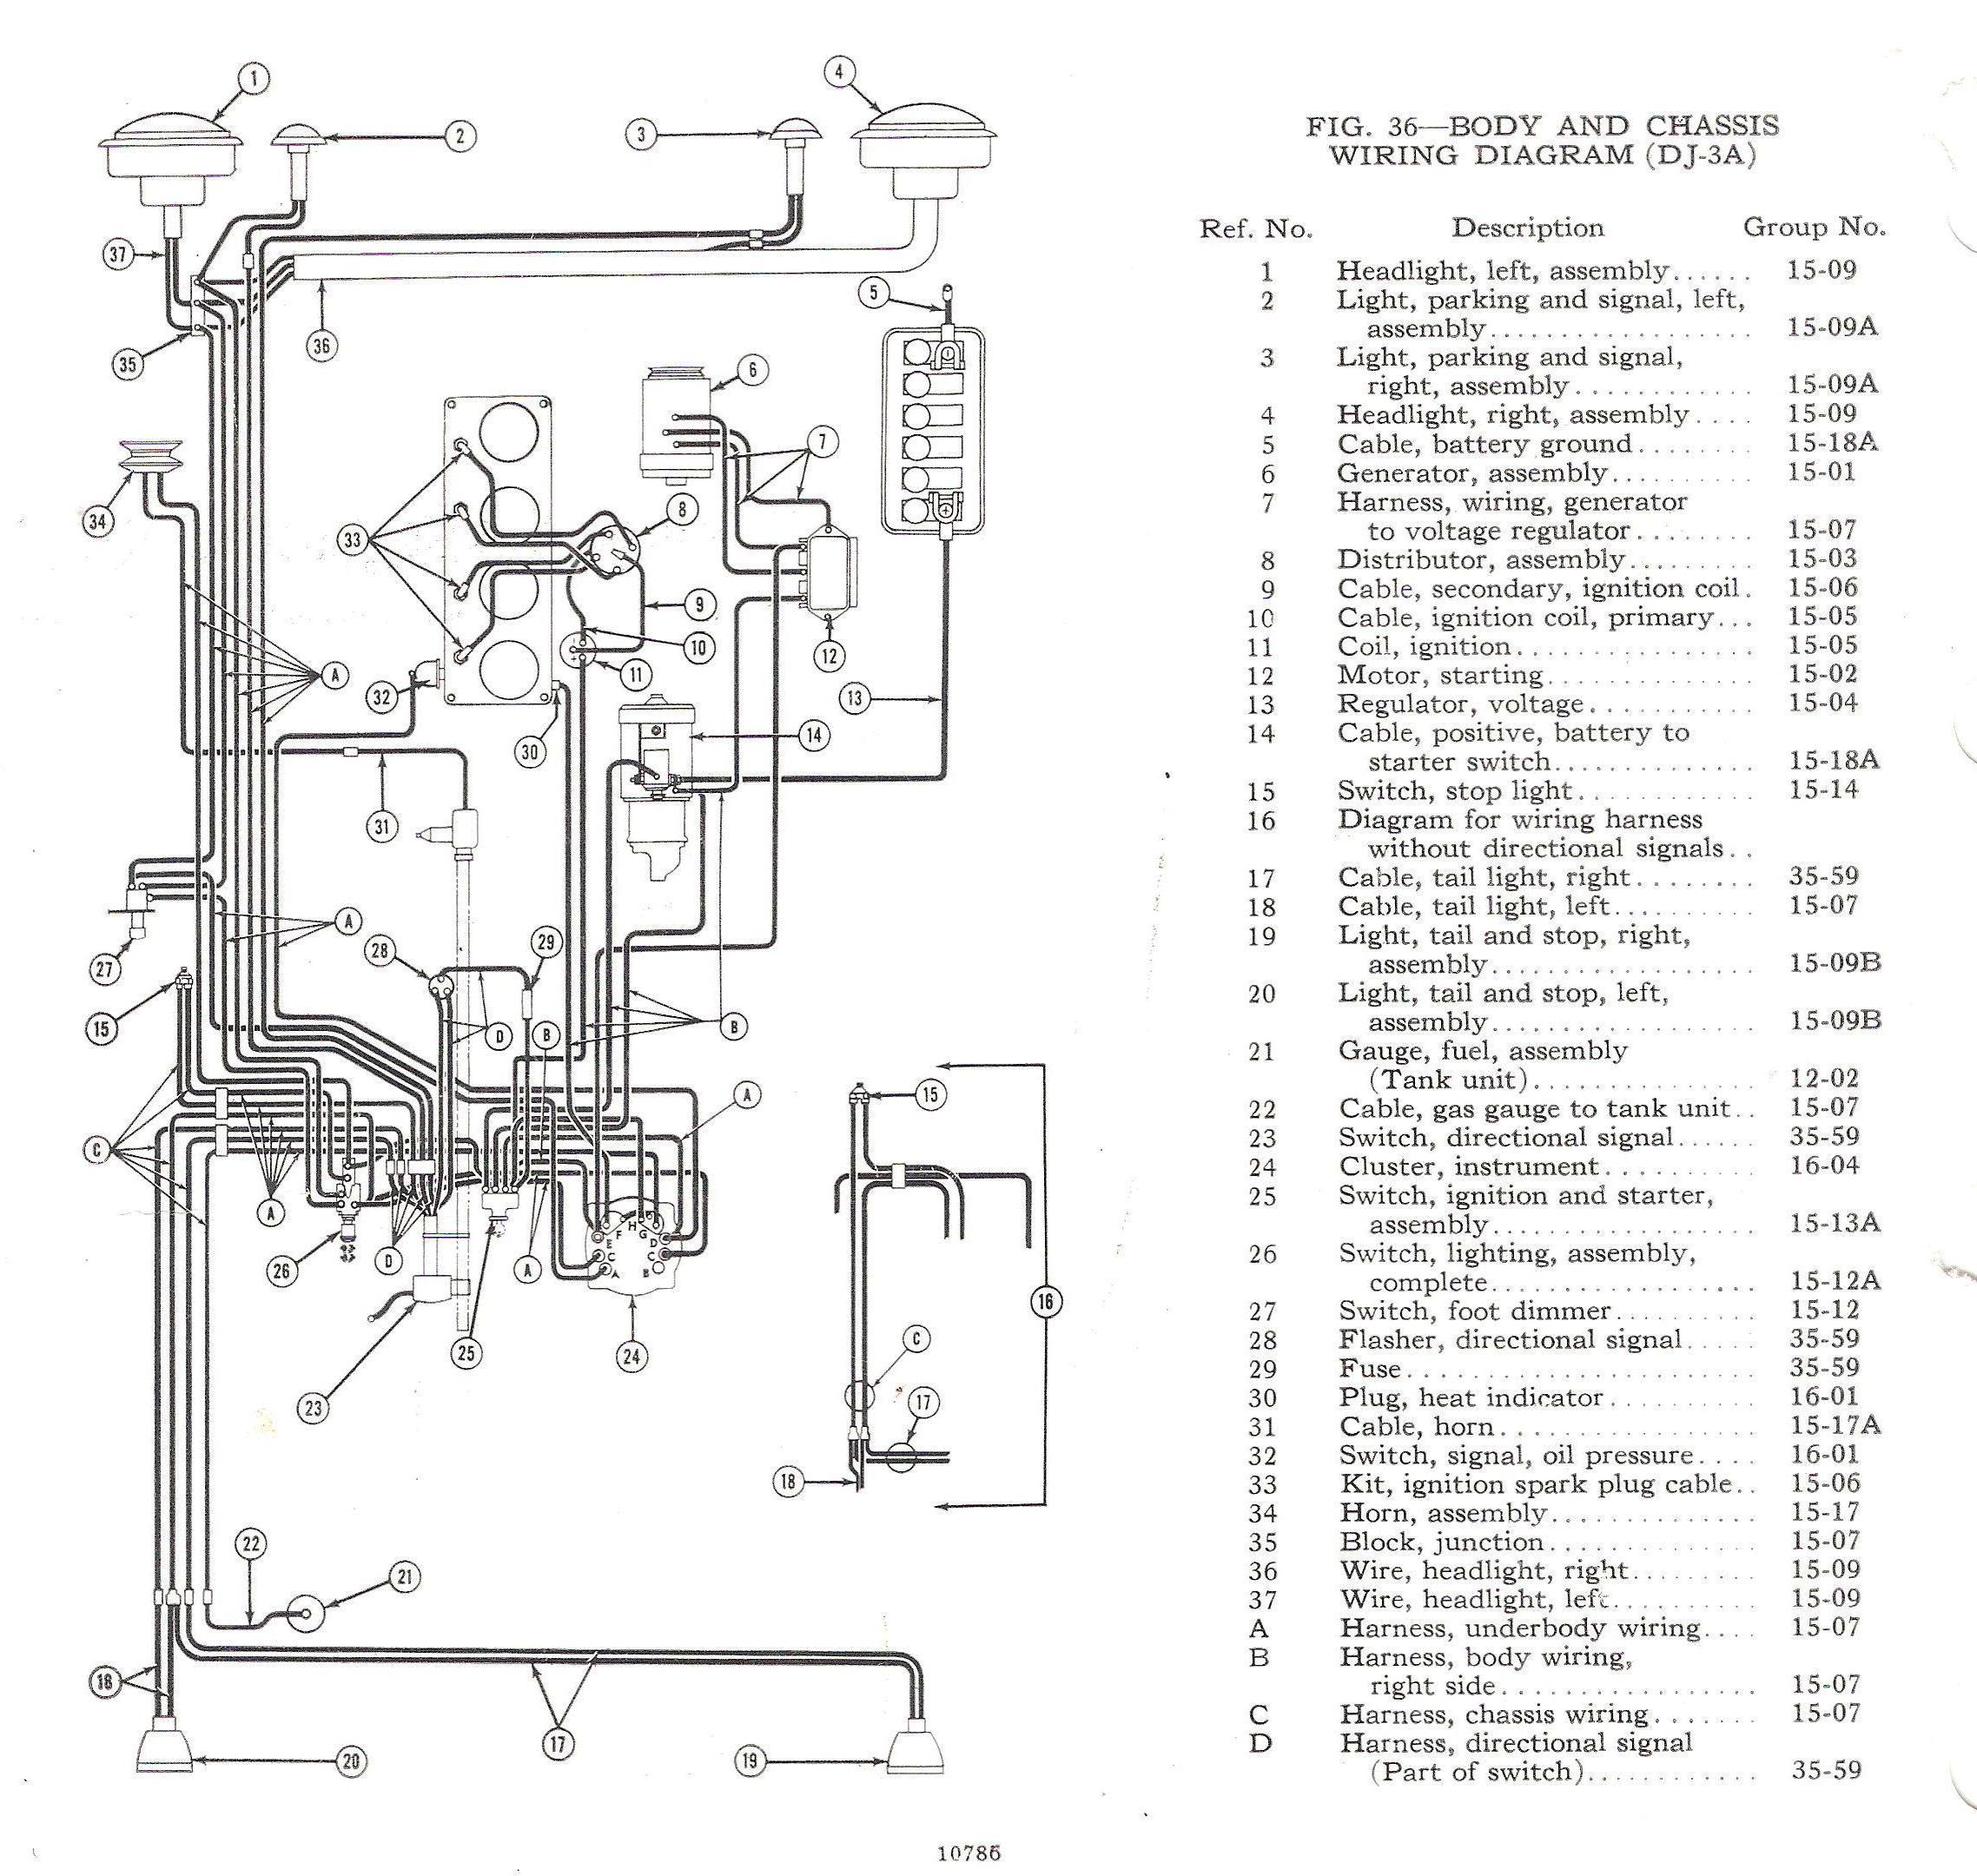 1958 Jeep Cj5 Wiring Schematic Wiring Diagram View A View A Zaafran It